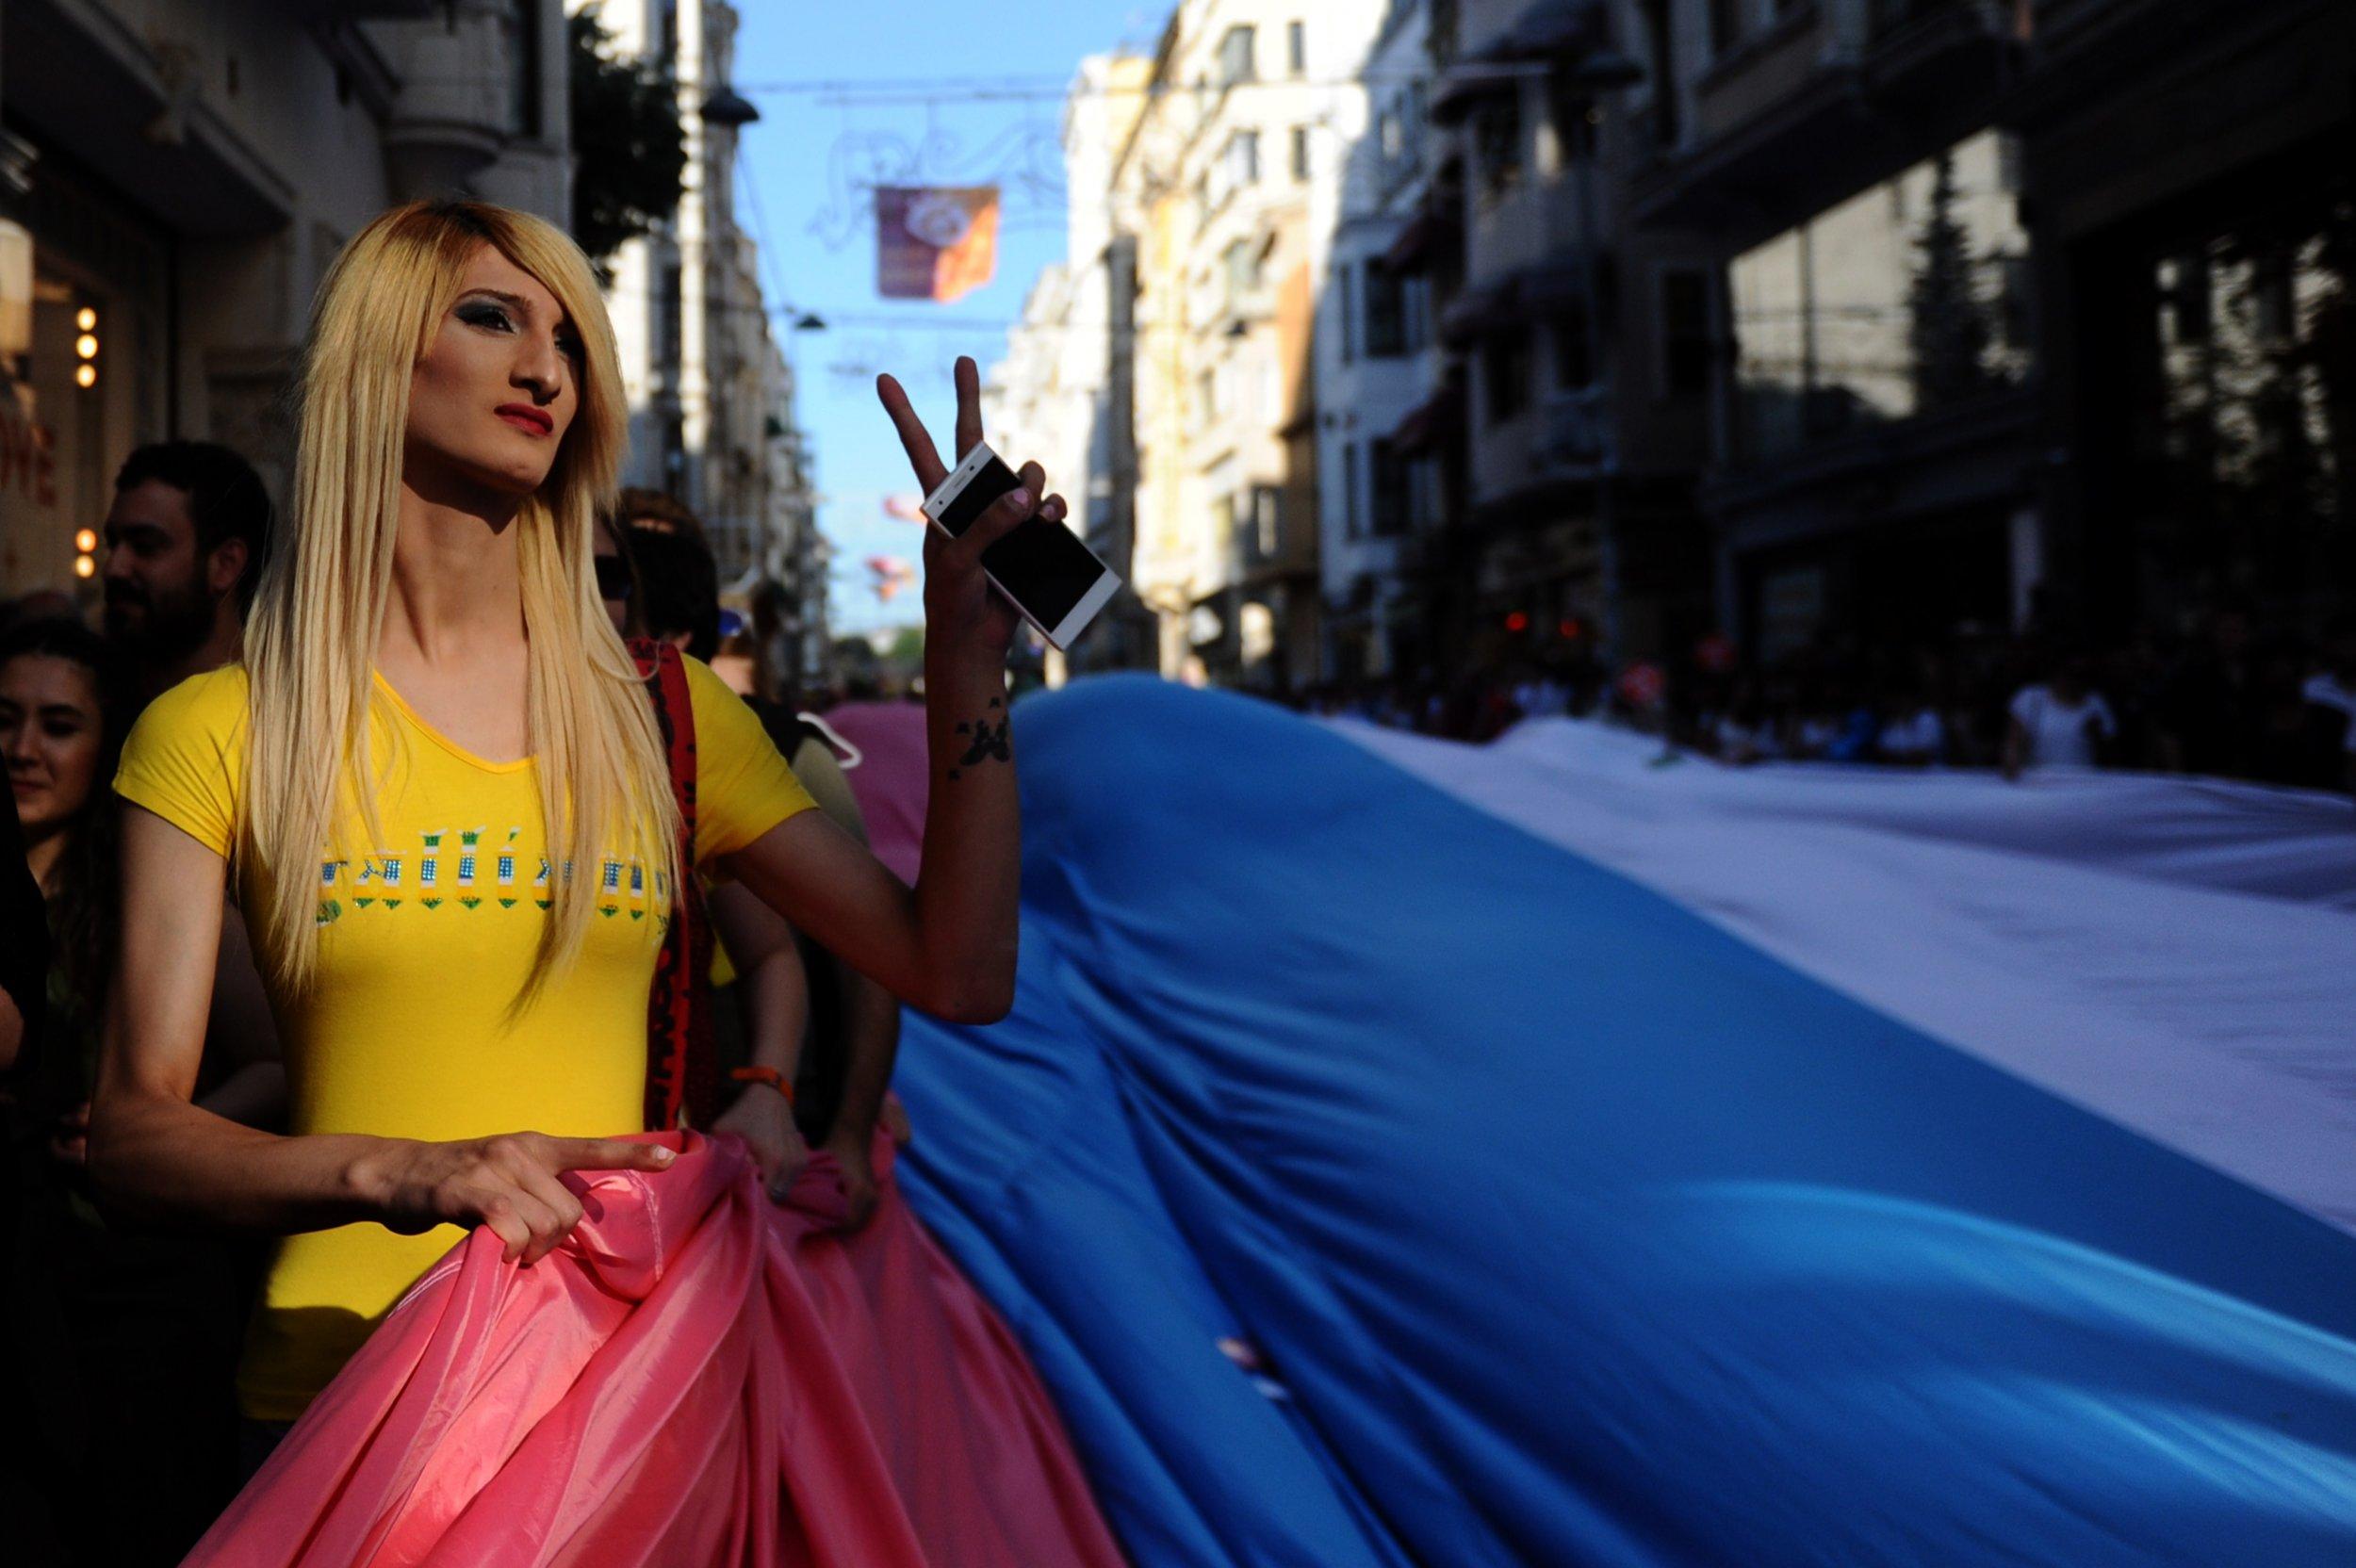 Transgender pride Istanbul, Turkey